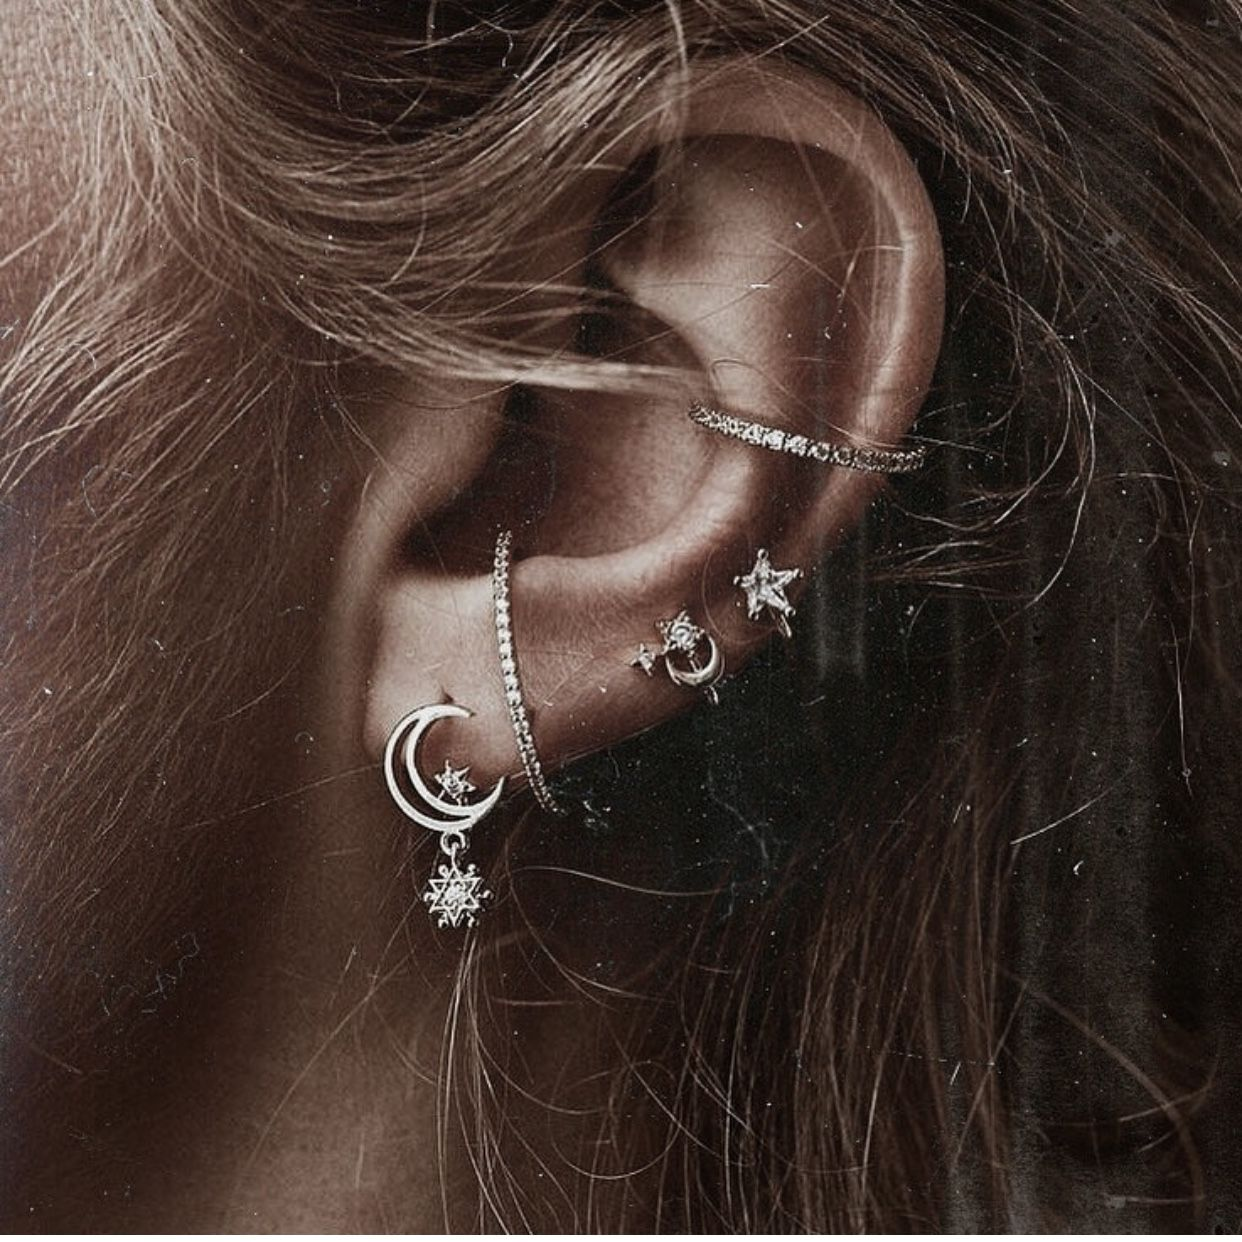 Septum piercing vs nose piercing  Pin by Eleanor Schwennesen on Piercings  Pinterest  Piercings